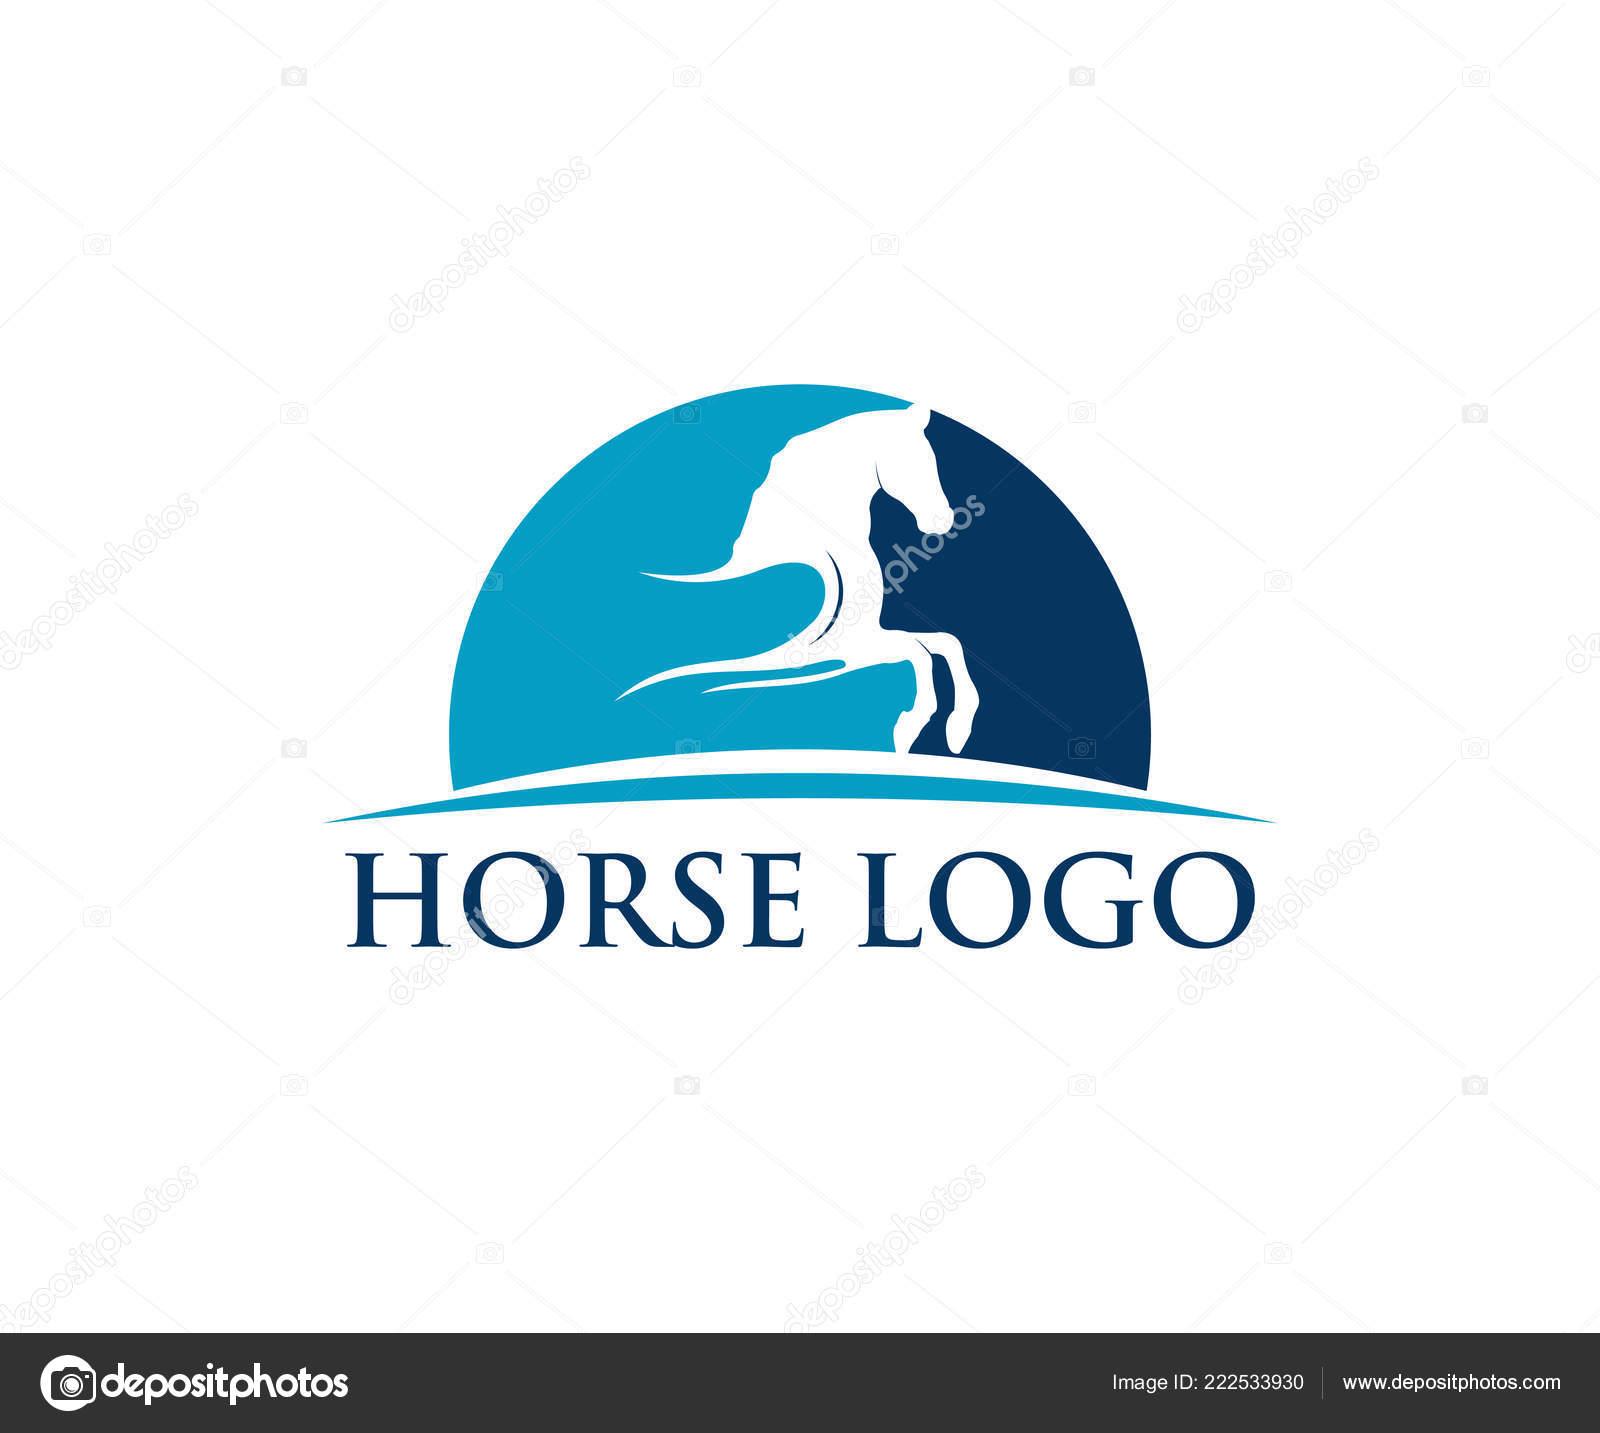 Sport Logo Design Inspiration Simple Horse Sport Vector Logo Design Inspiration Racing Equestrian Farm Stock Vector C Great19 222533930